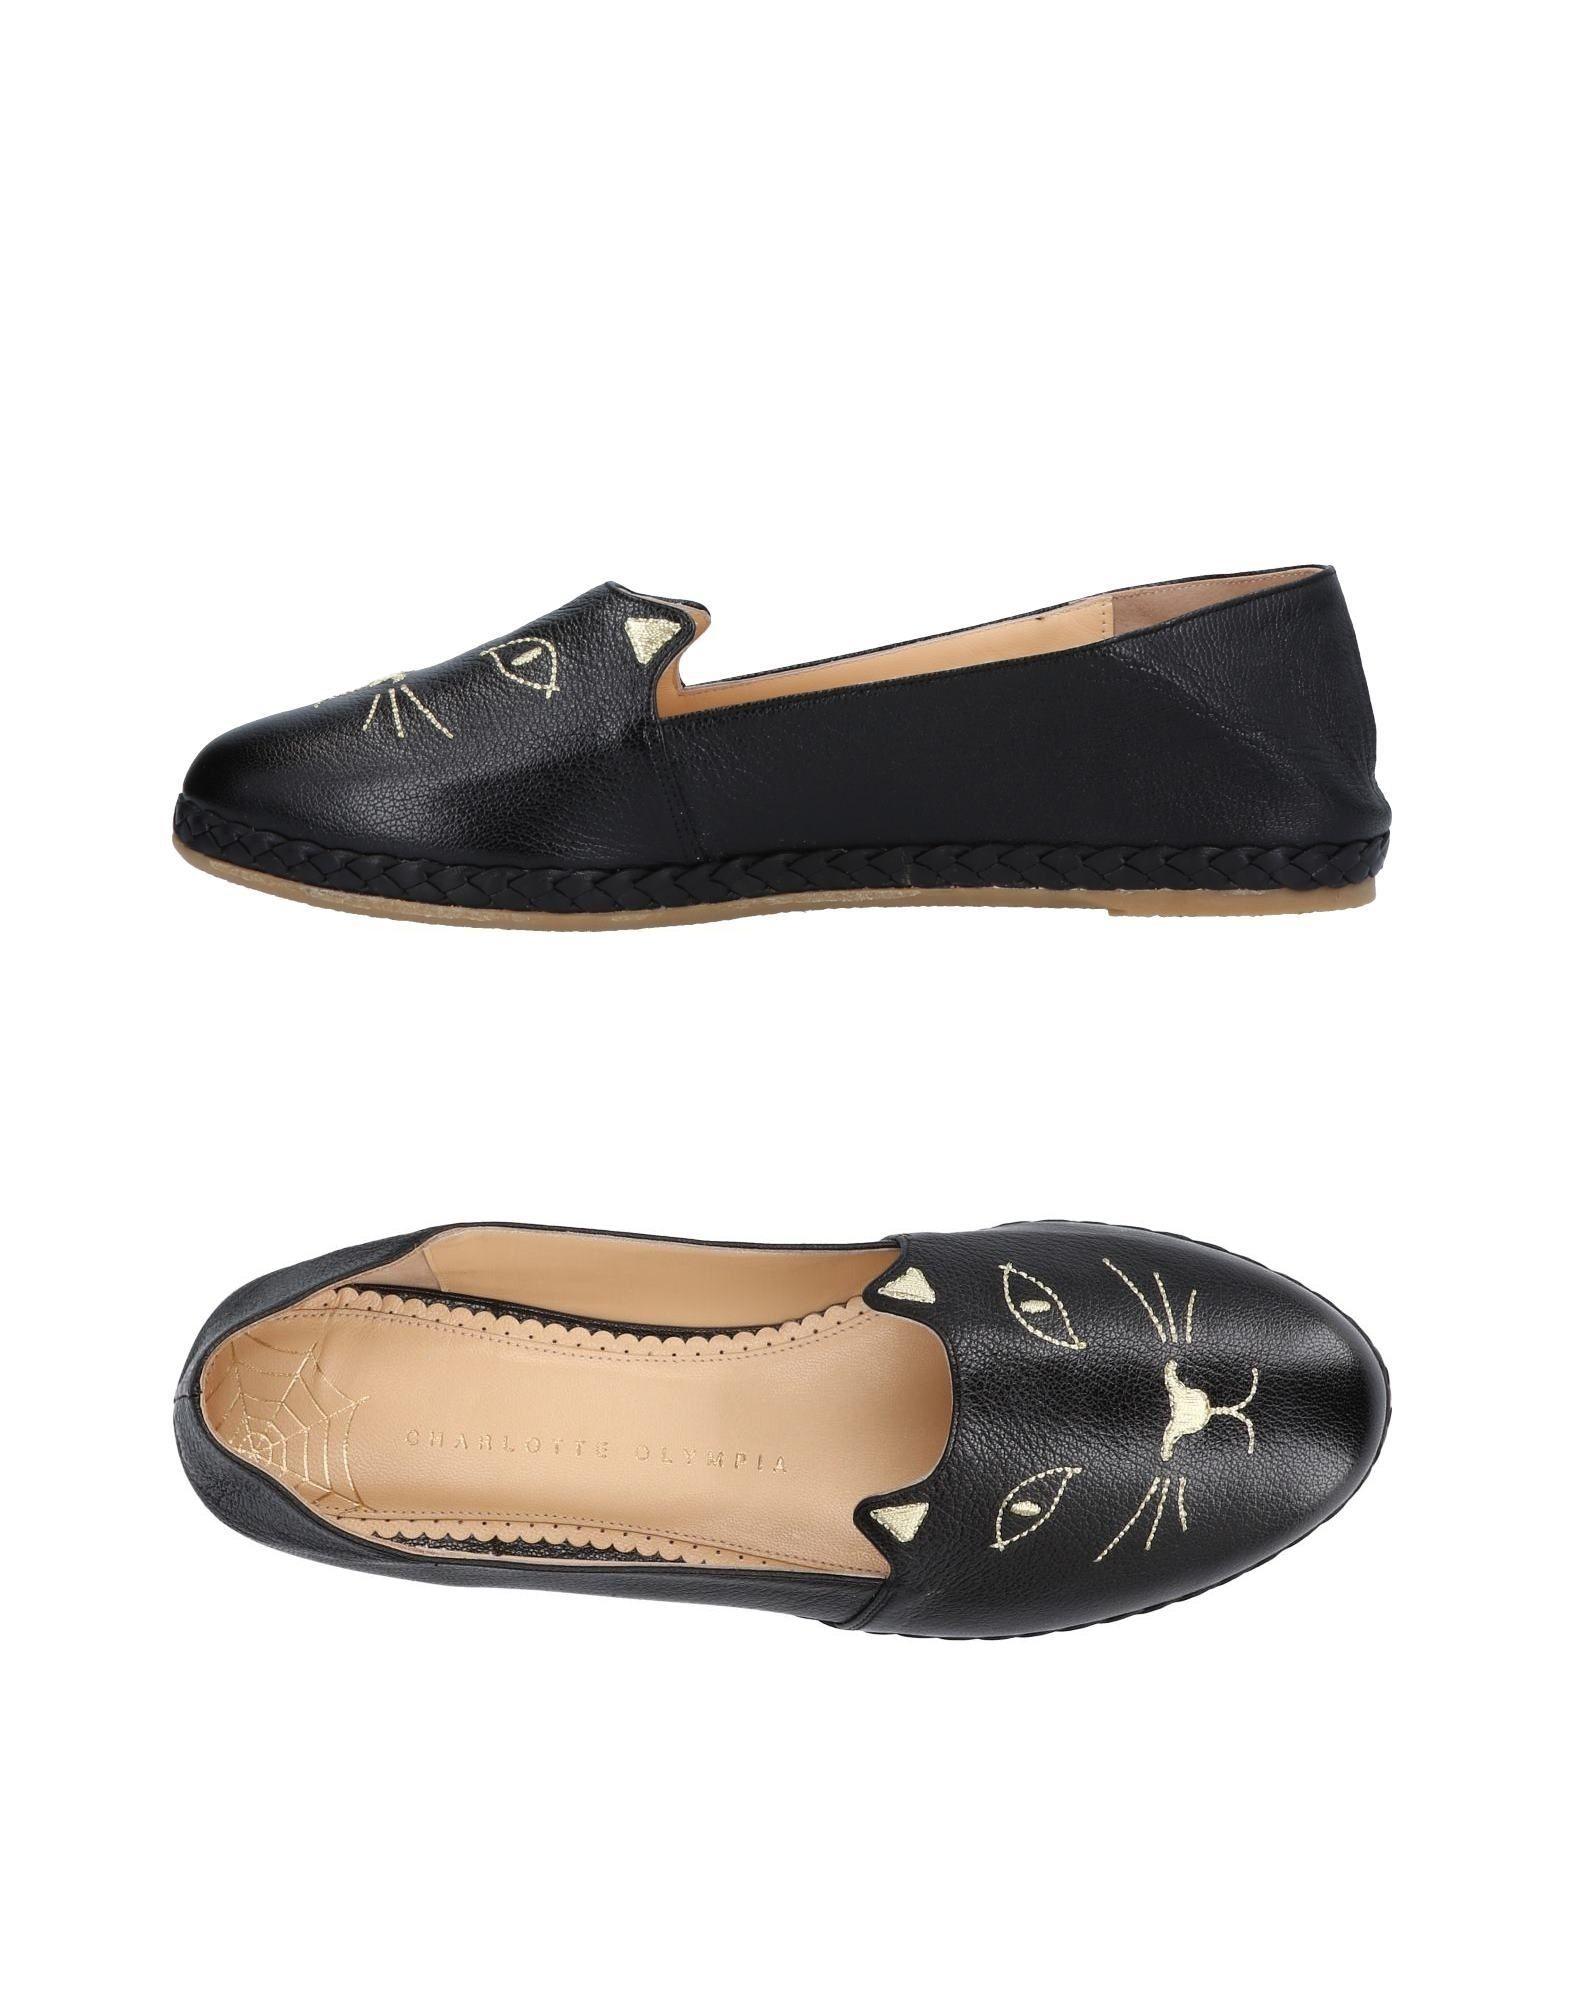 Rabatt Schuhe Charlotte Olympia Ballerinas Damen  11463687BK